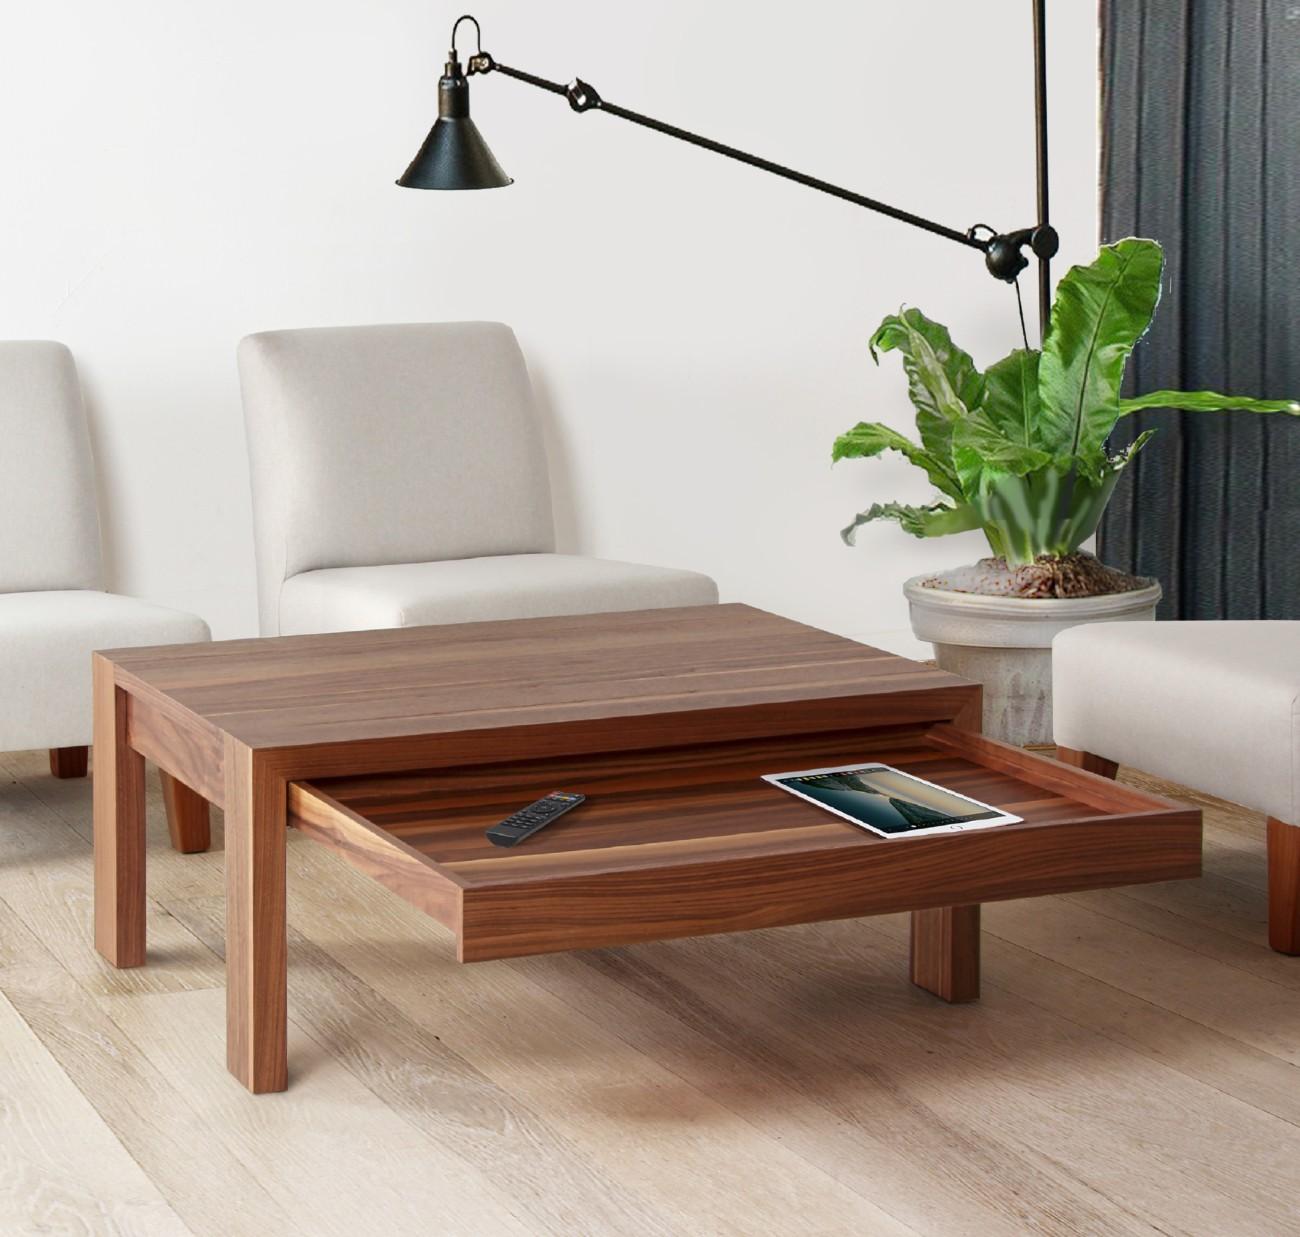 table basse rectangulaire avec tiroir en bois